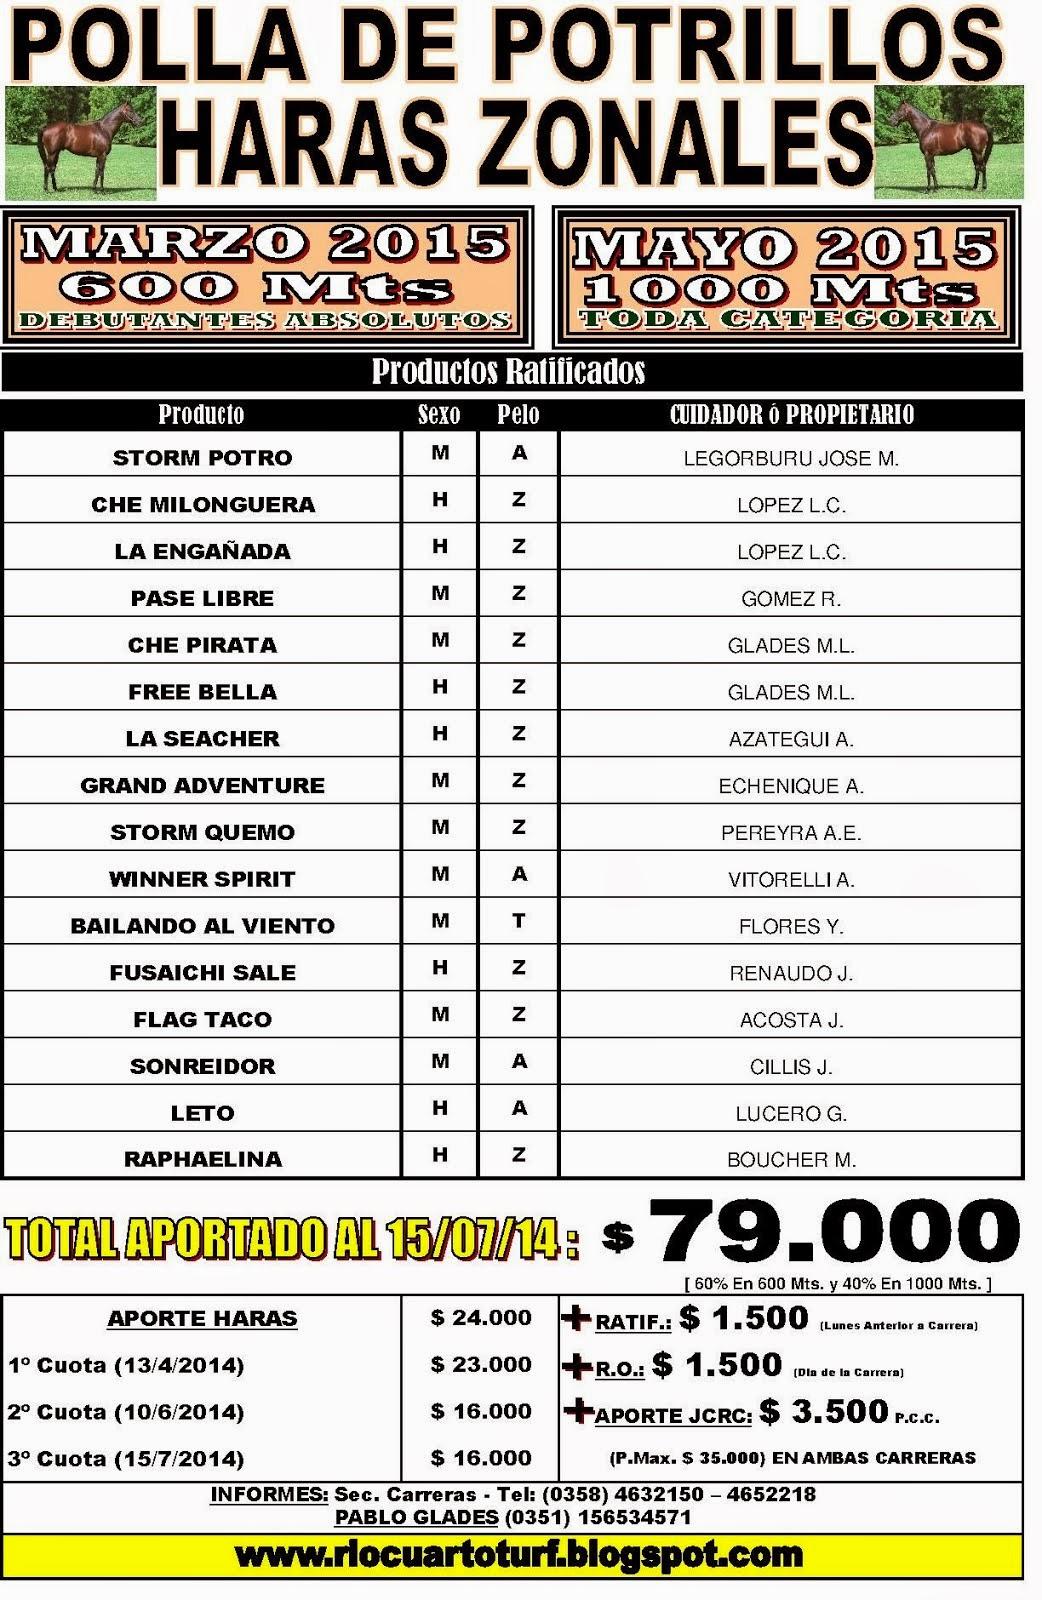 Polla Hs Zonales 2015.-